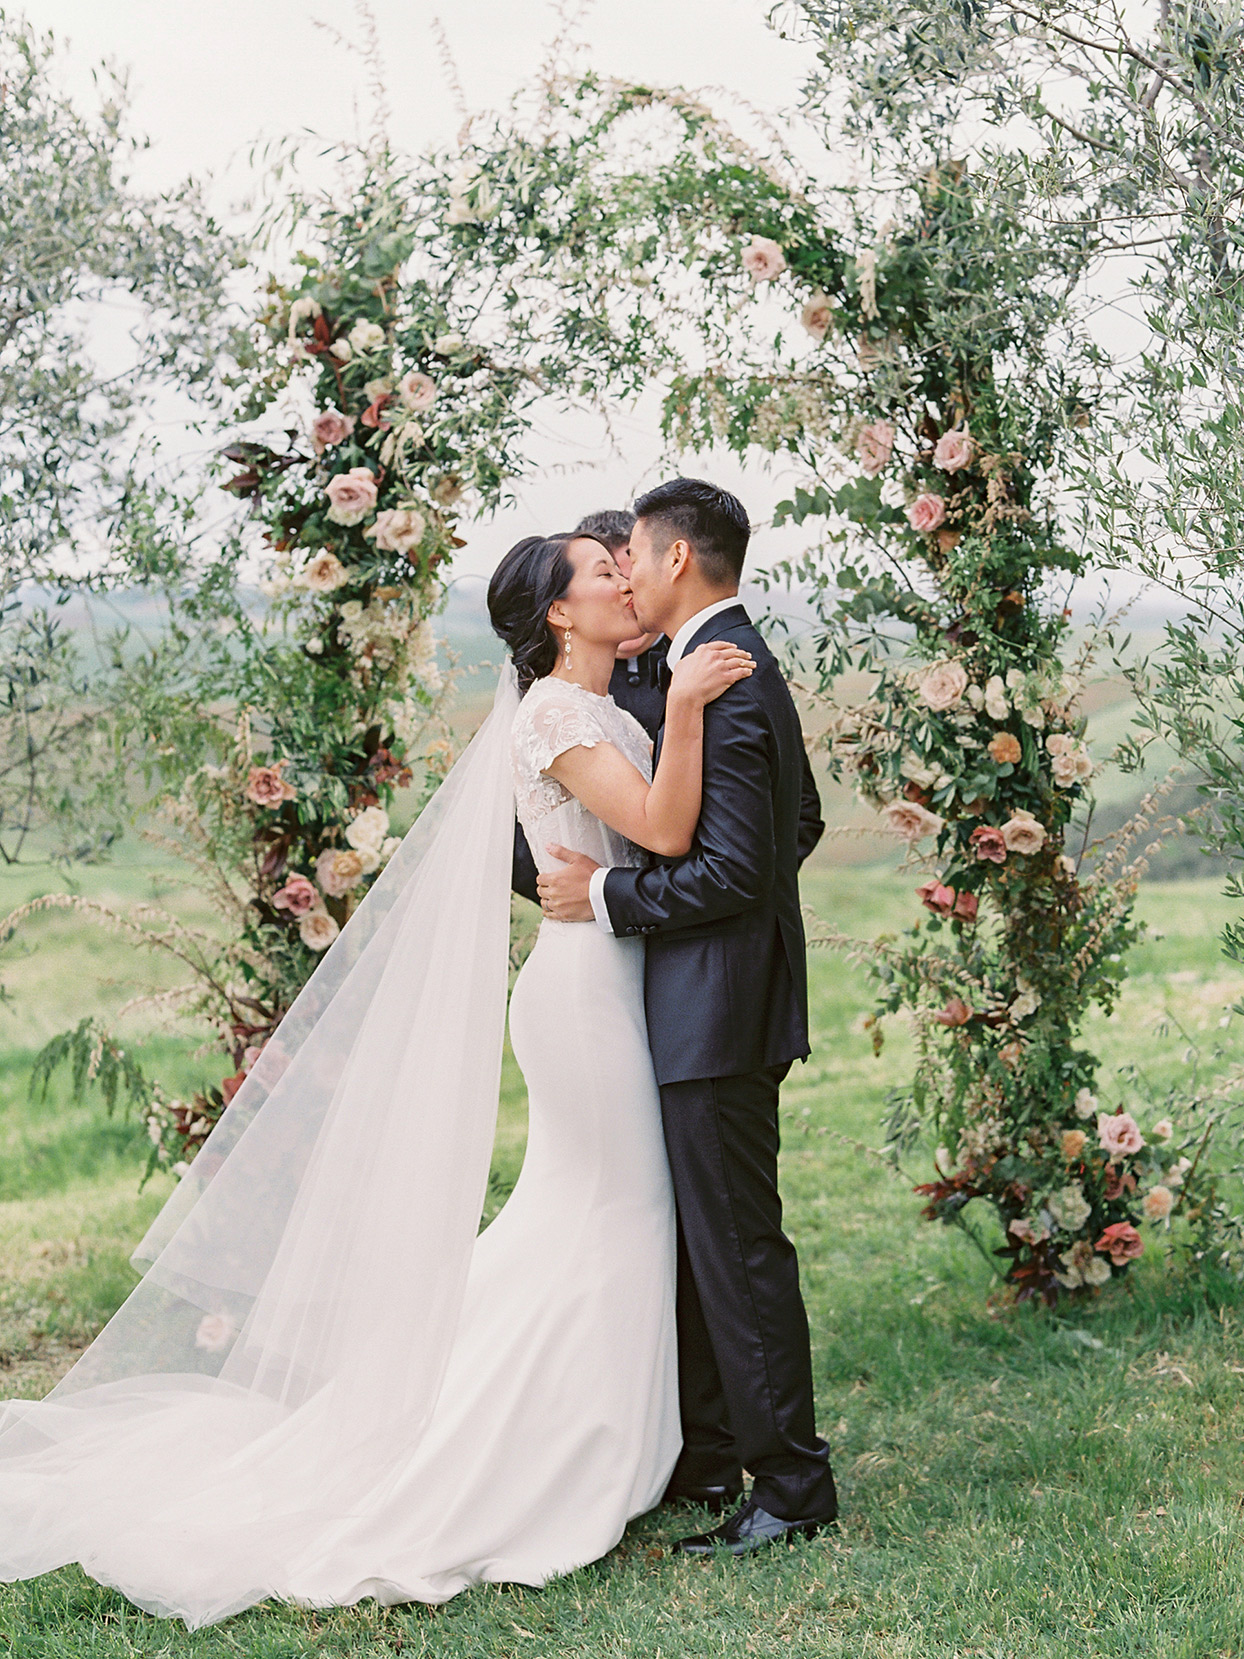 jen alan wedding kiss under arch